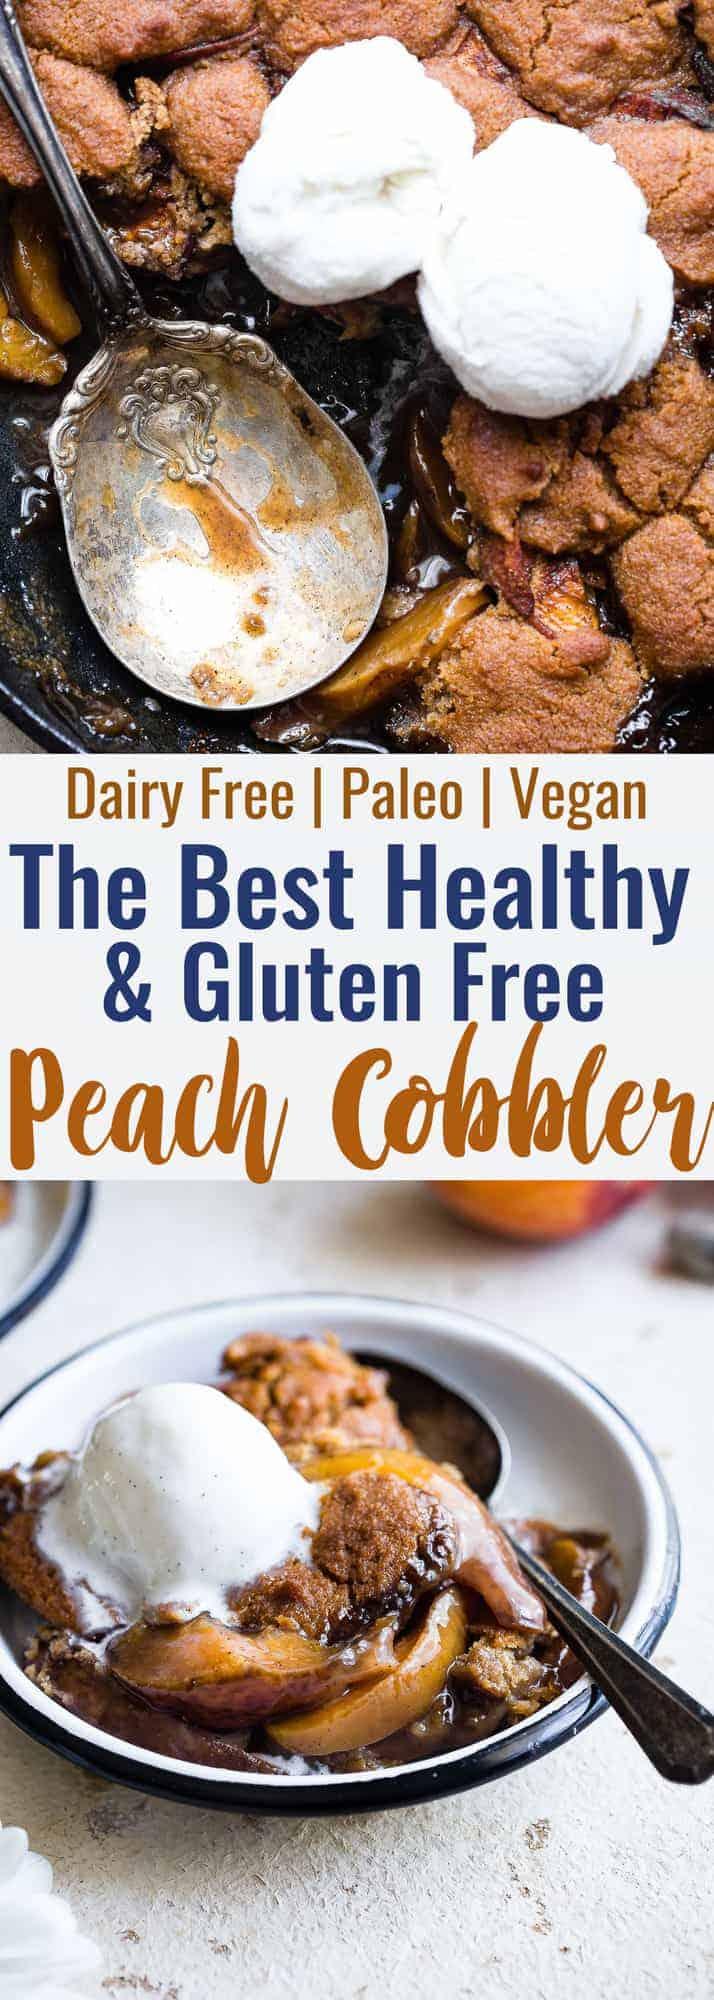 collage photo of paleo peach cobbler